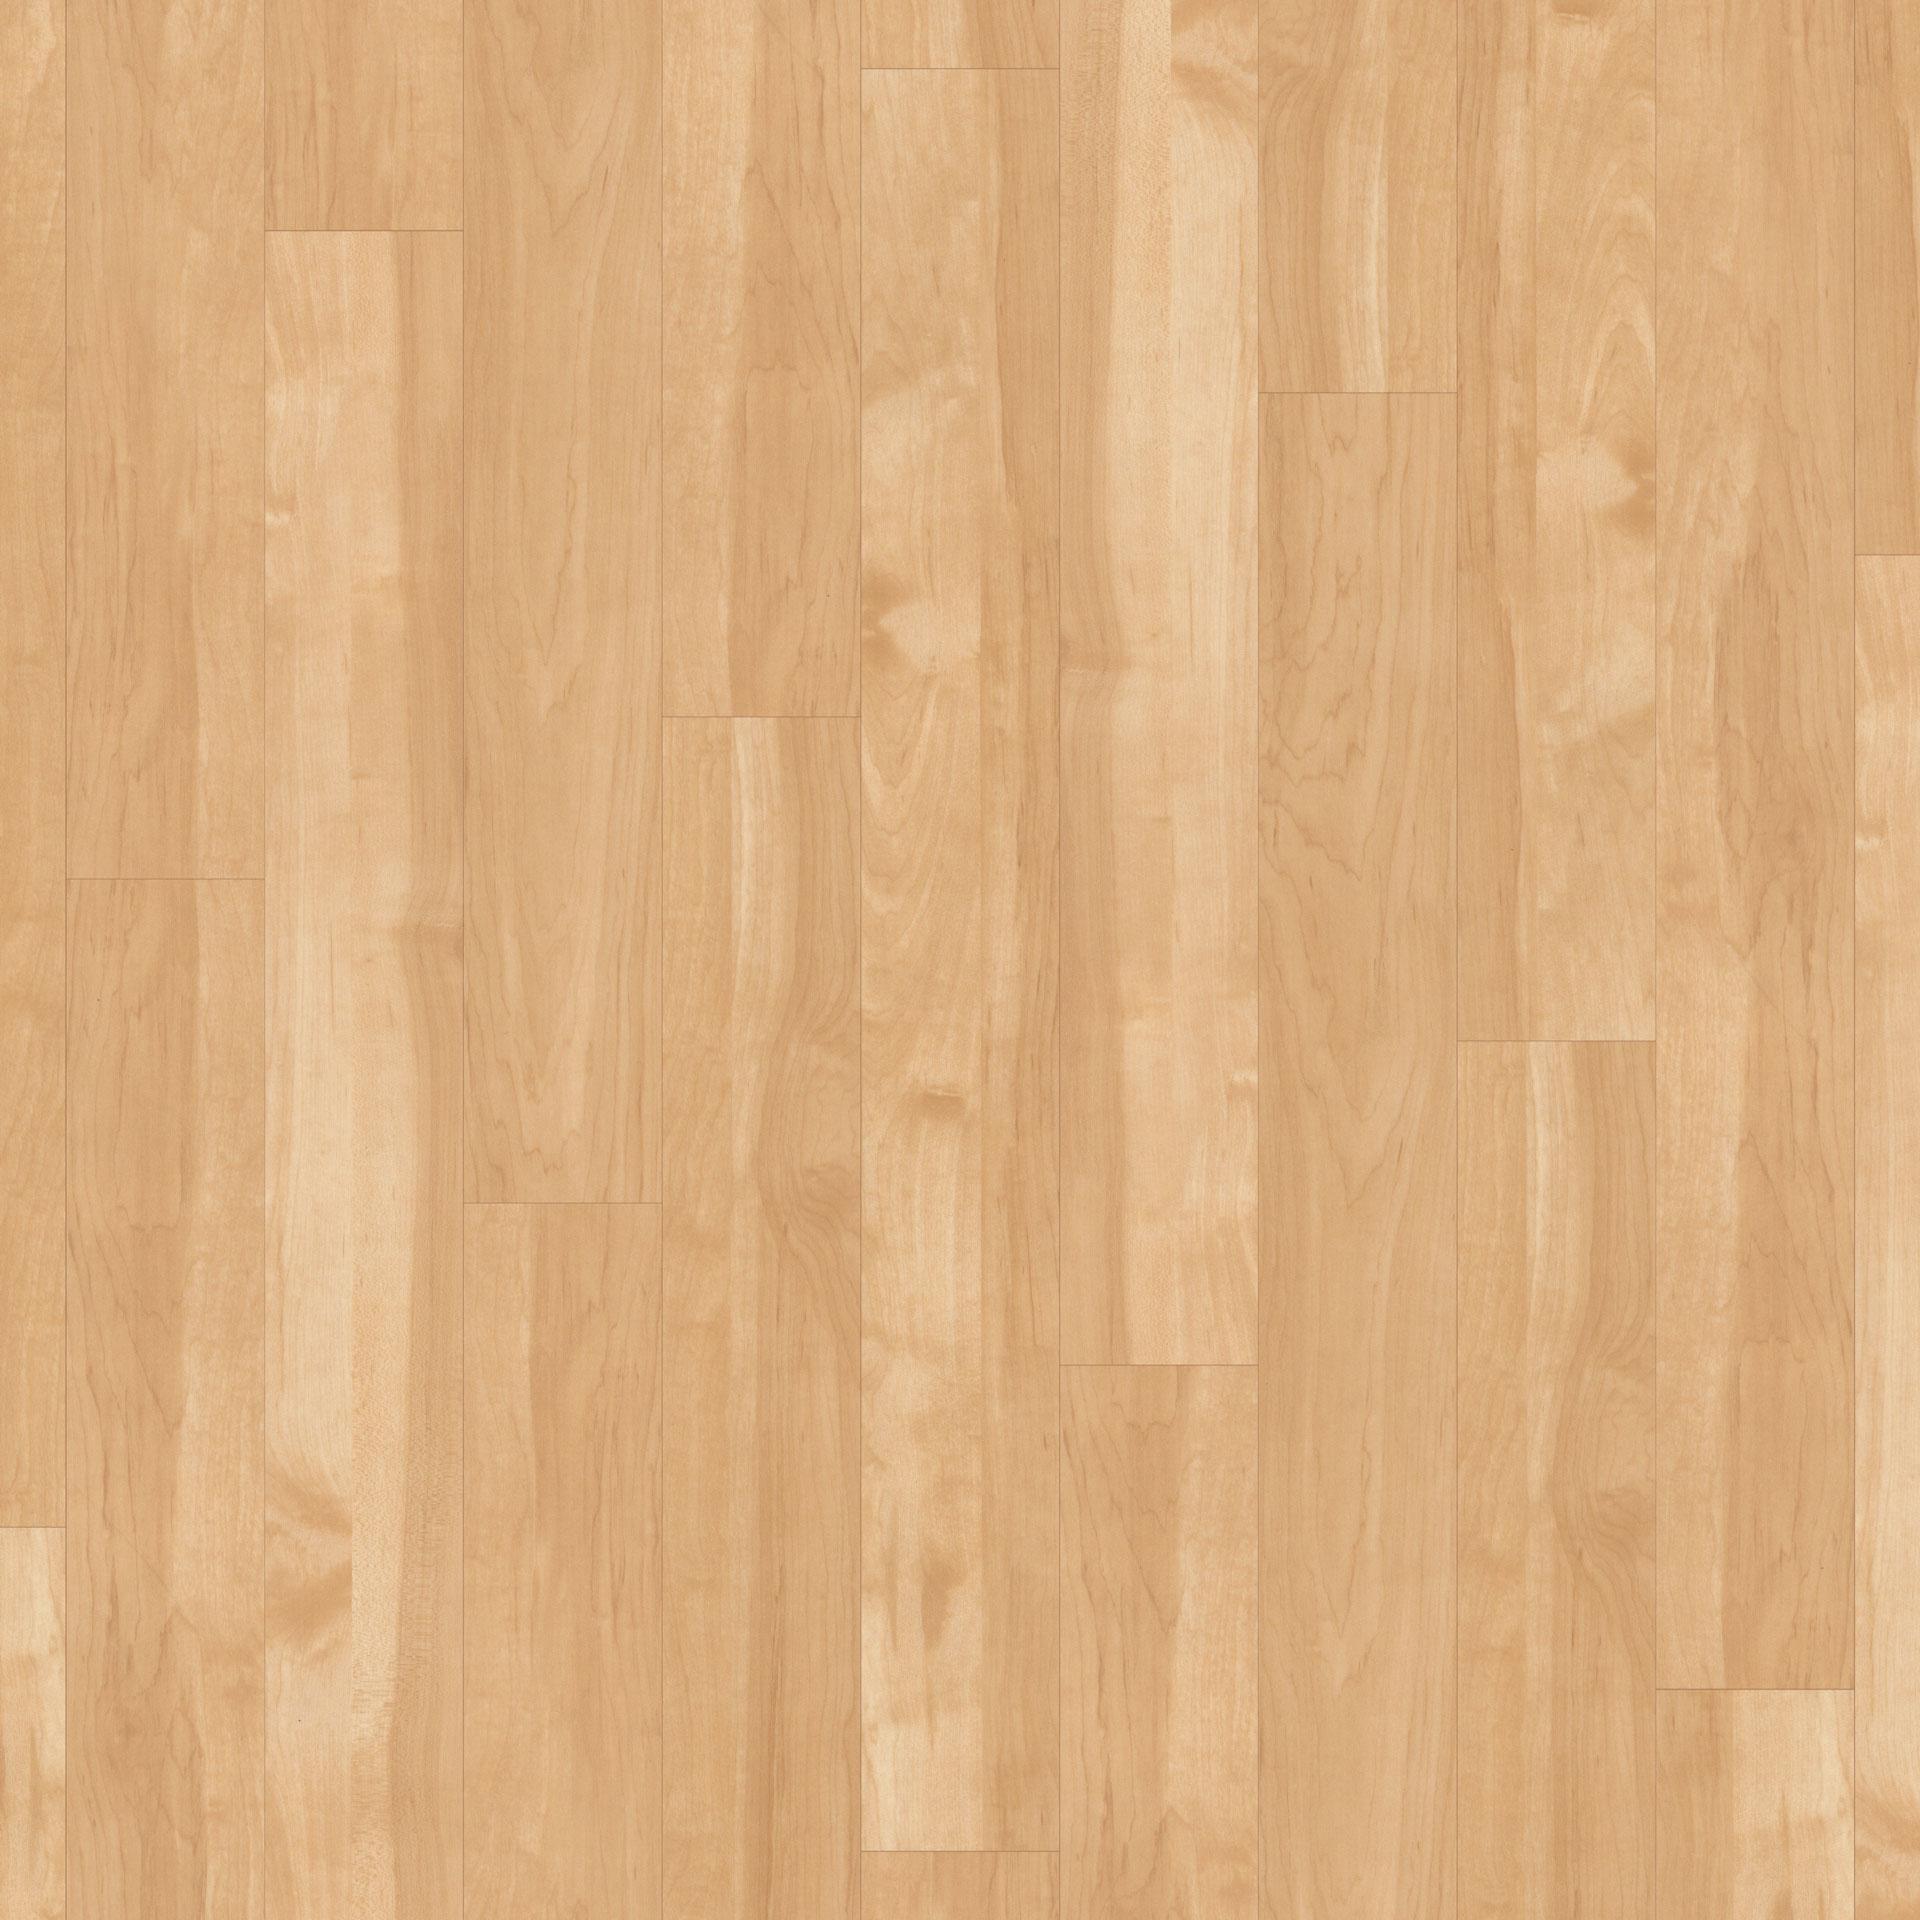 floor wood kp32 sycamore DVKAZIC